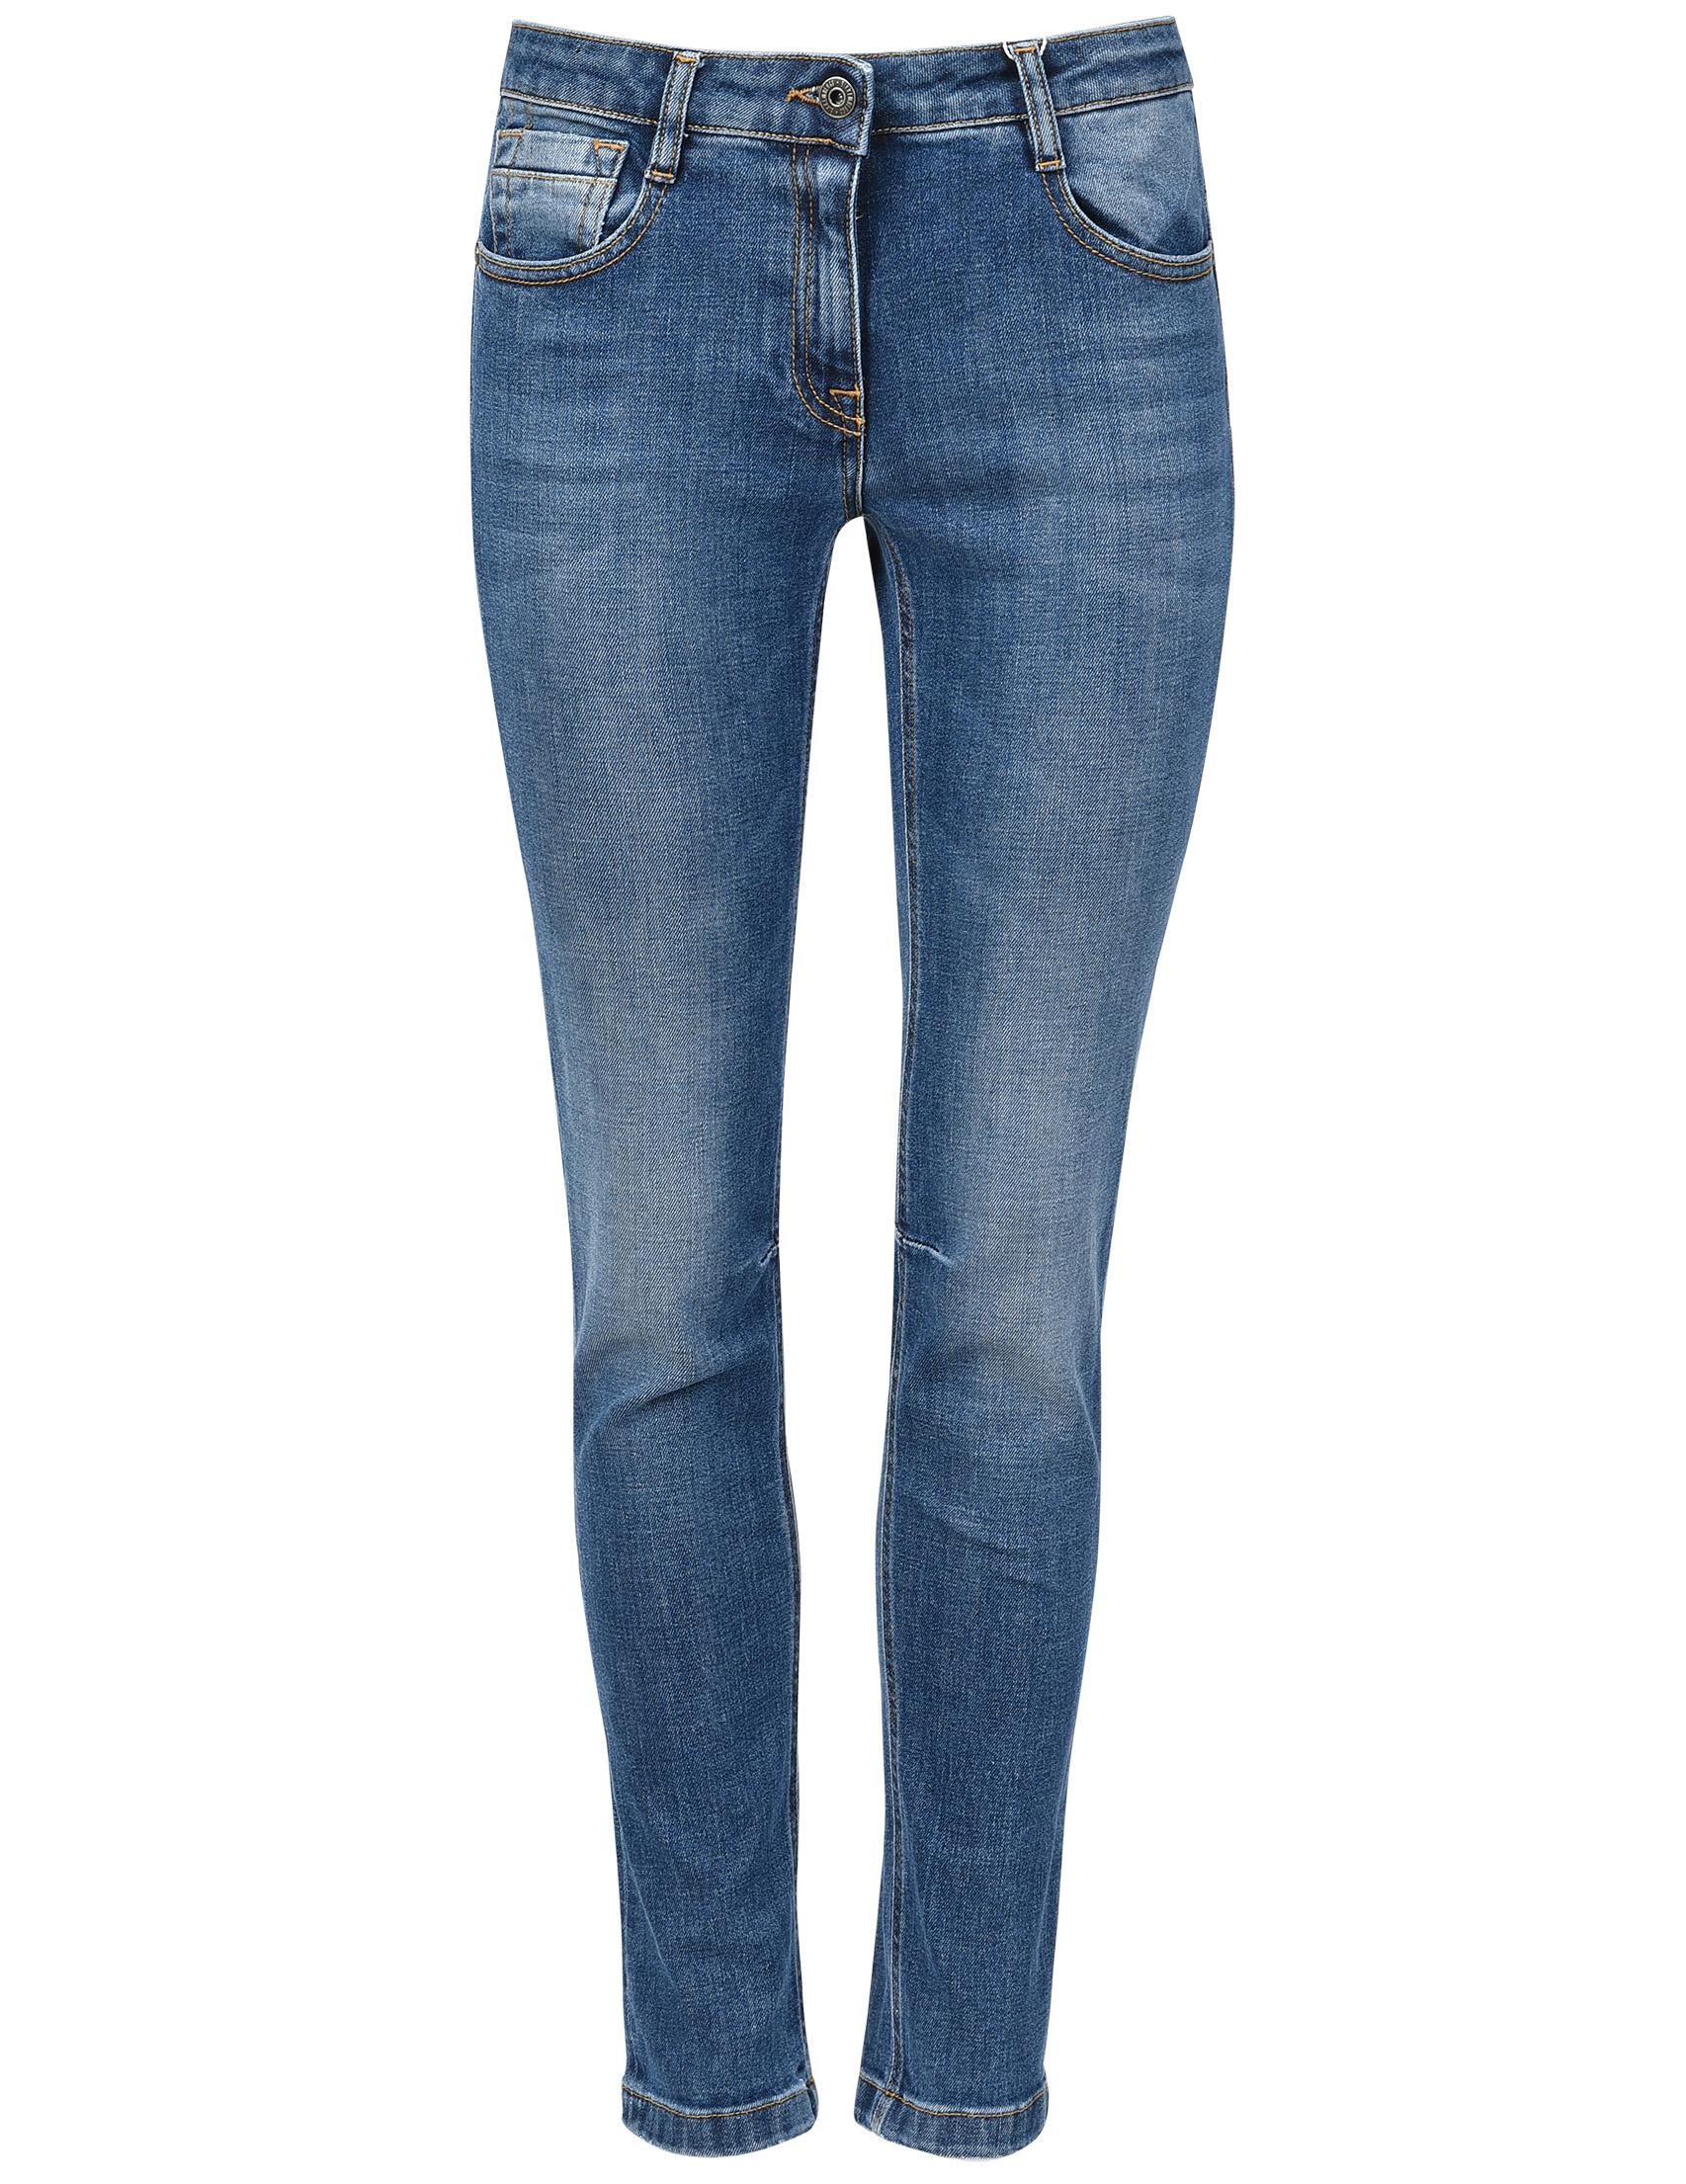 Женские джинсы BIKKEMBERGS 10100-066B_blue